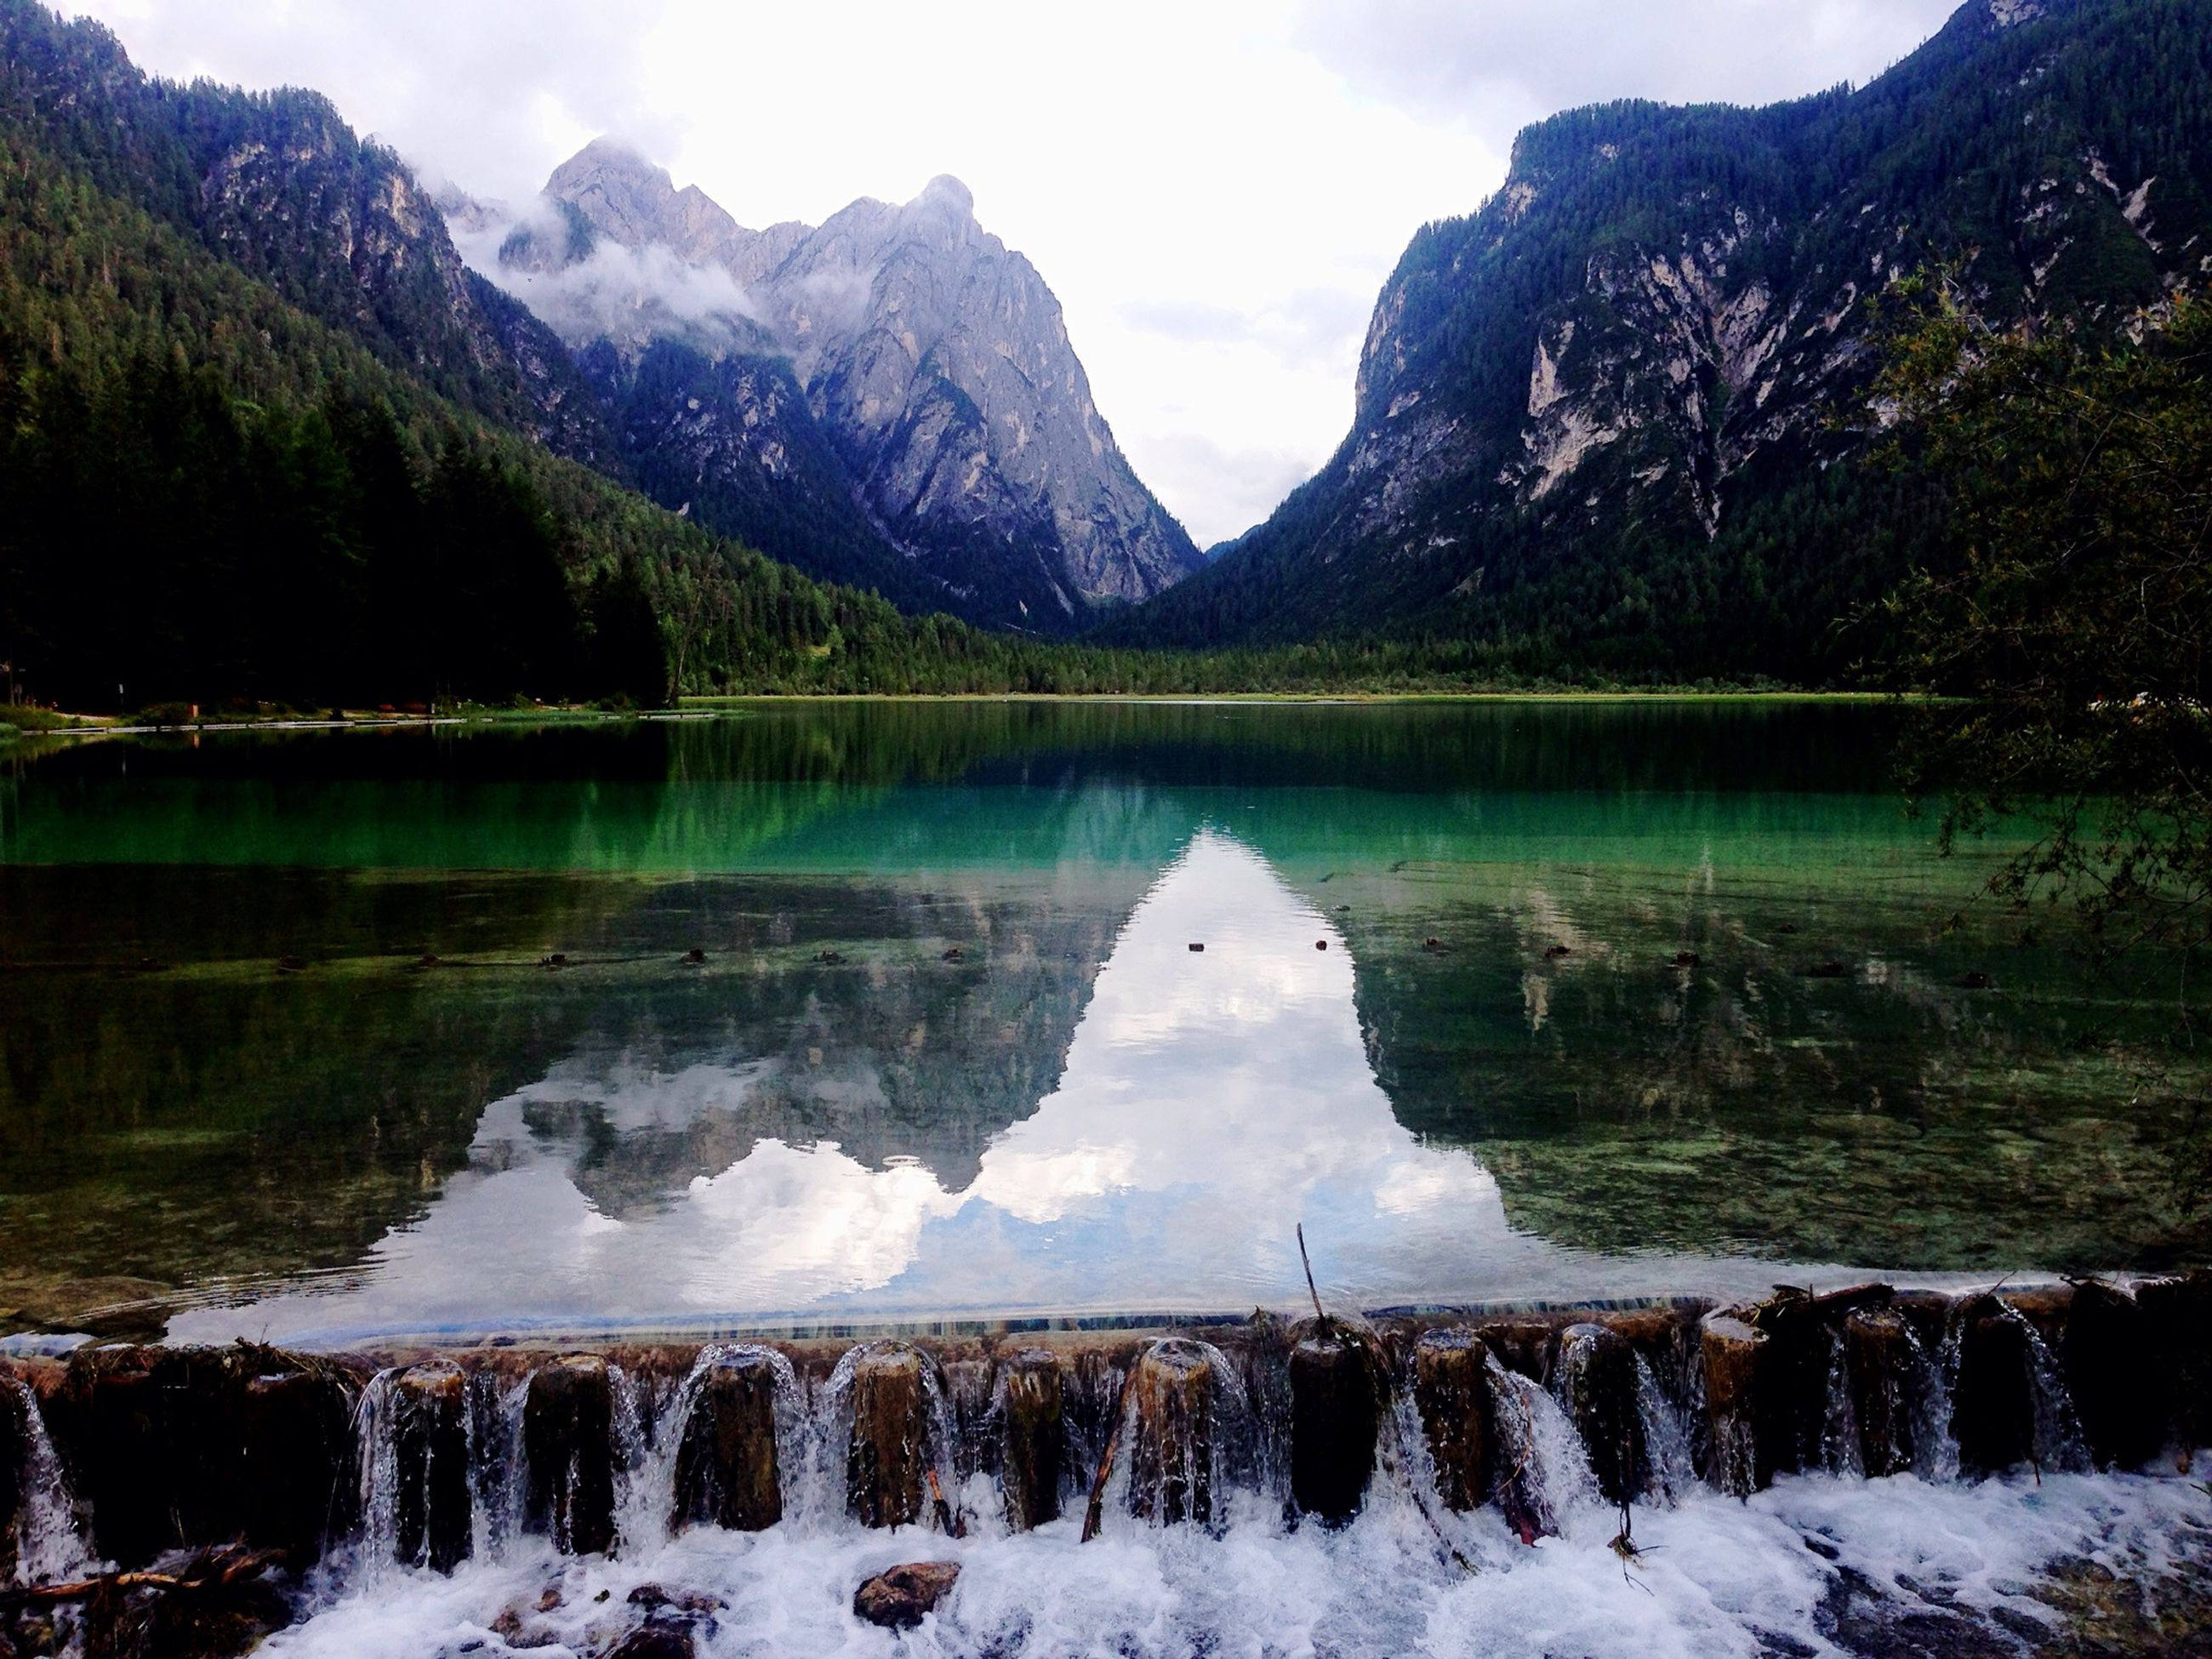 mountain, snow, winter, cold temperature, tranquil scene, scenics, mountain range, water, tranquility, beauty in nature, lake, season, snowcapped mountain, reflection, nature, weather, sky, frozen, non-urban scene, idyllic